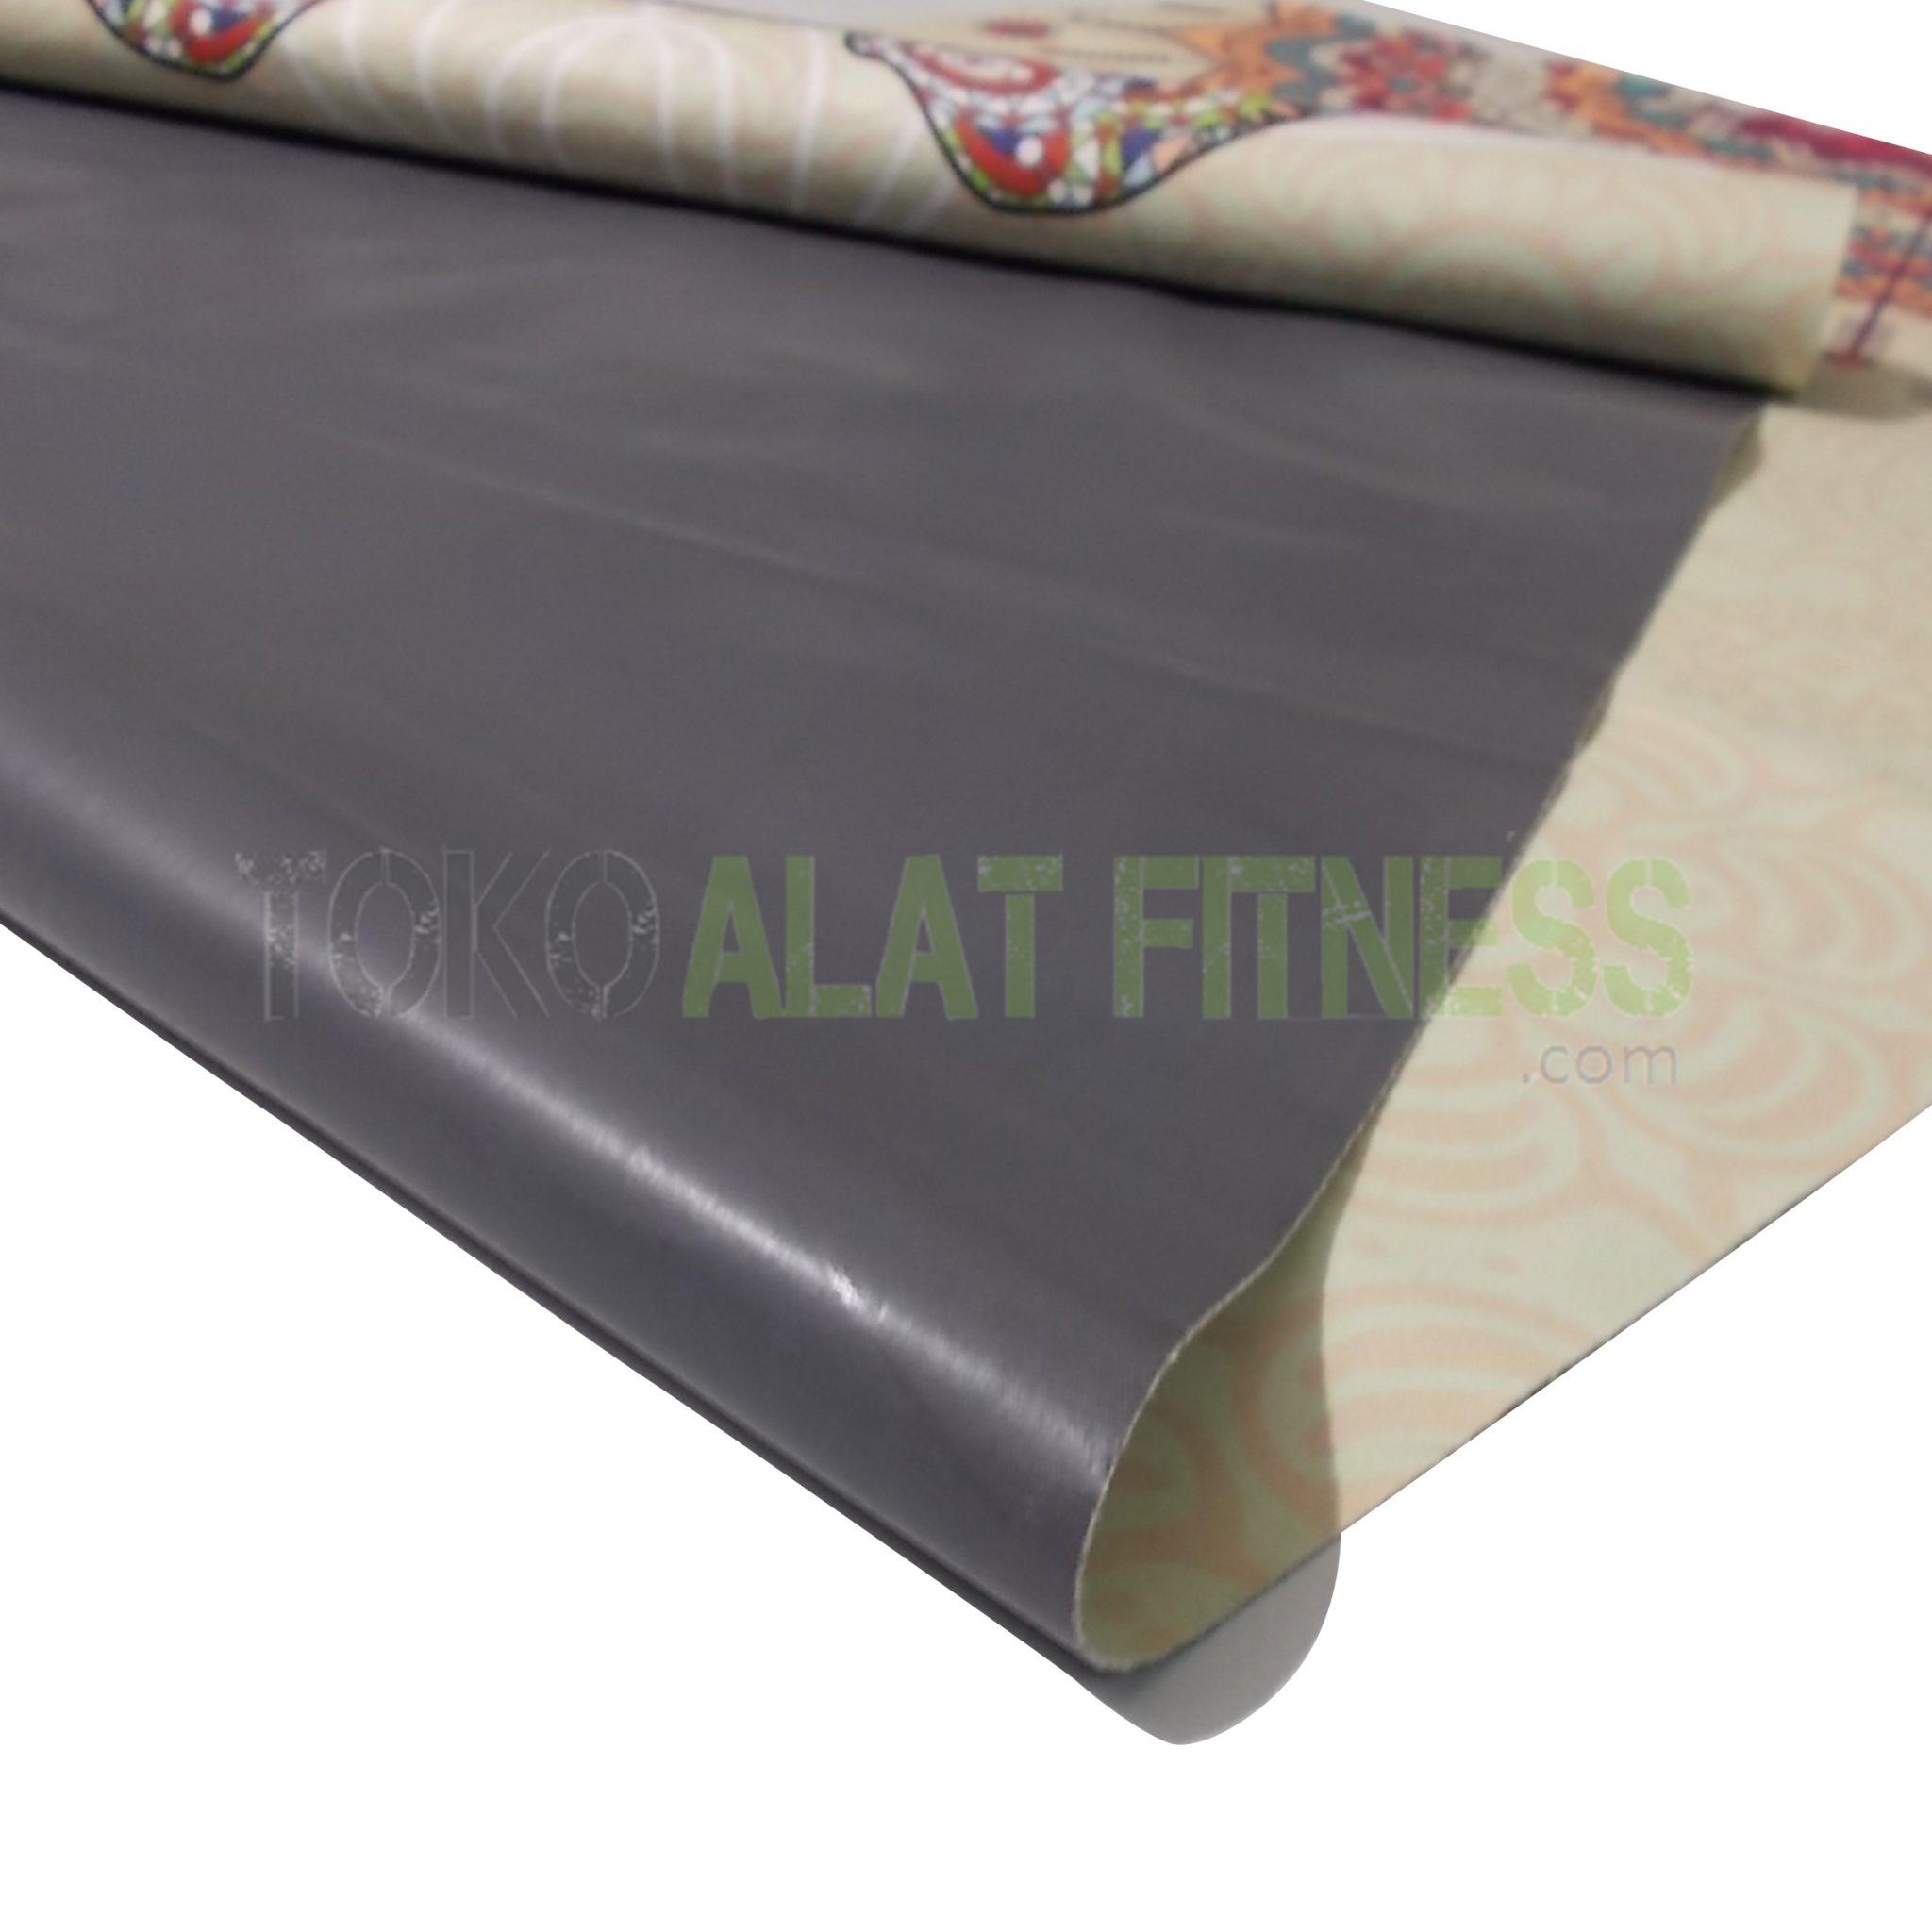 4 wtm 1 - Yoga Mat Rubber Plastik, Cream  Body Gym